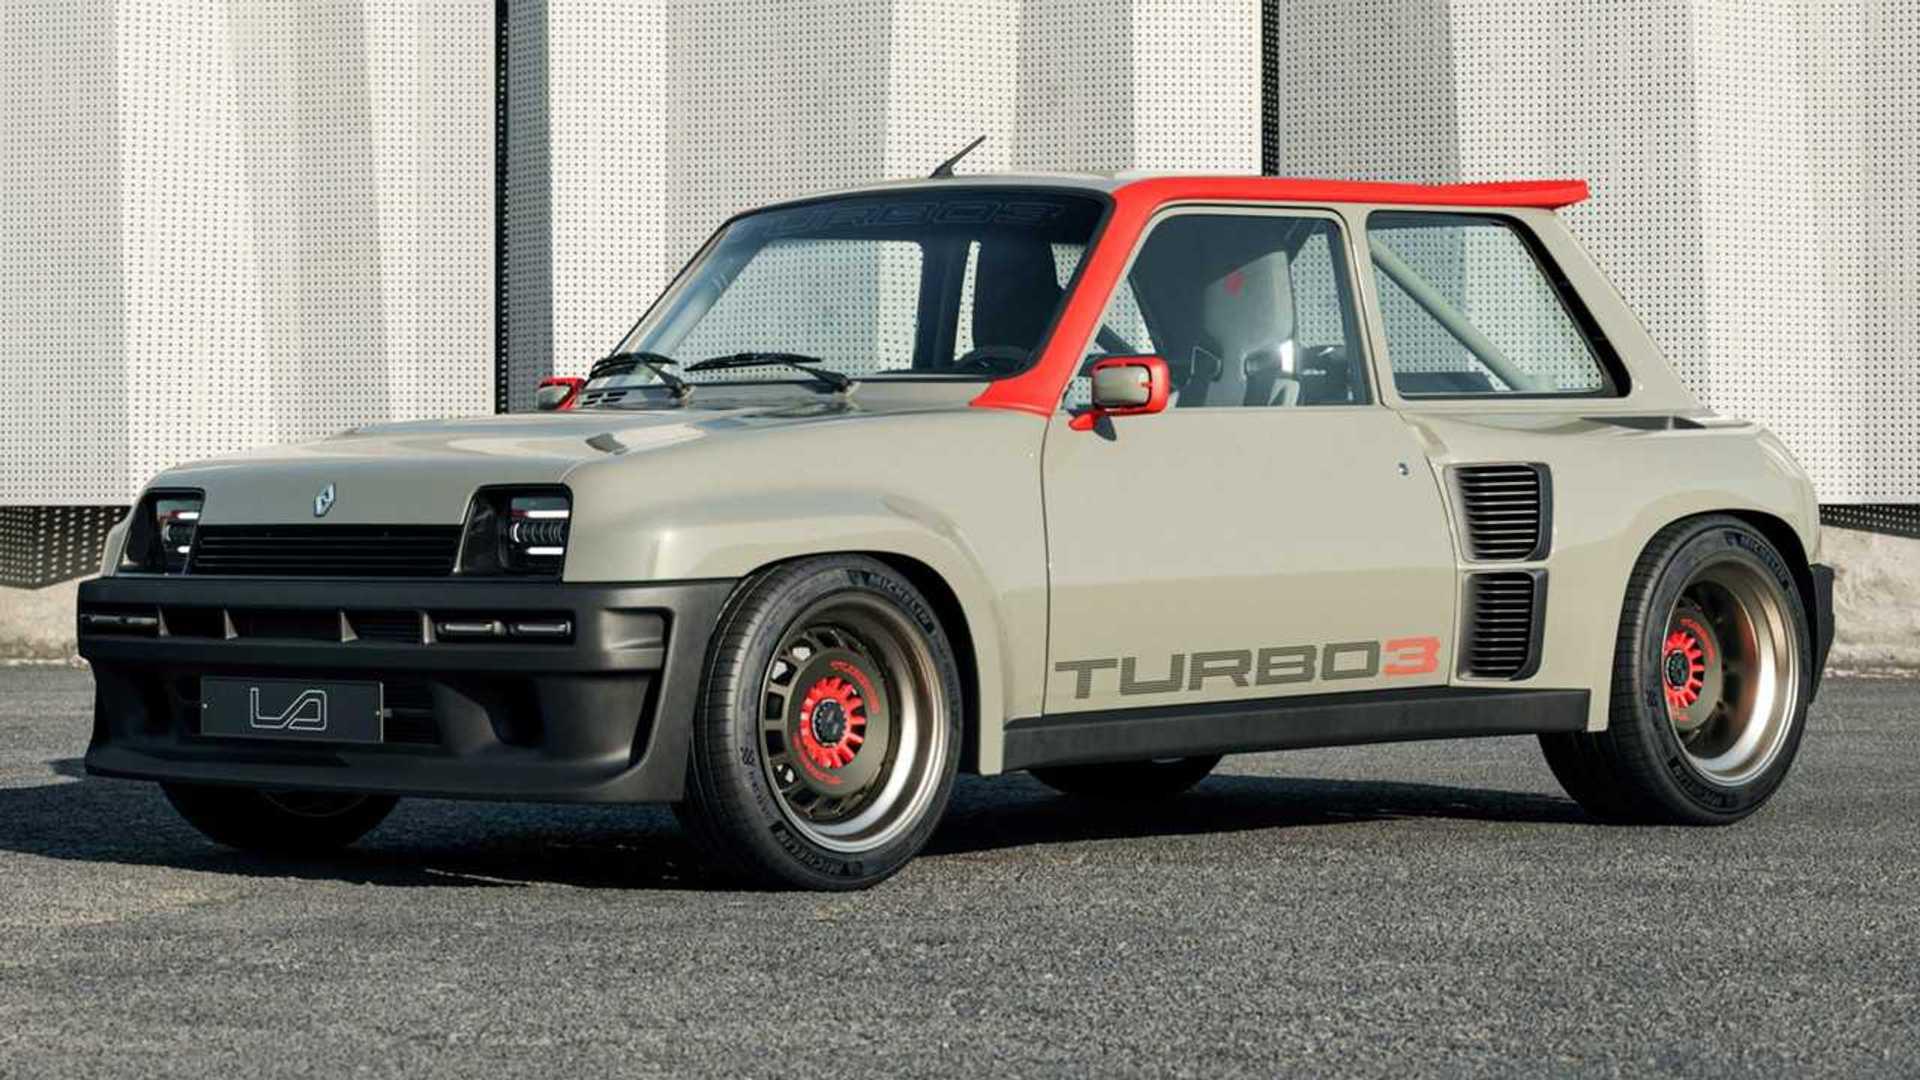 Renault 5 Turbo 3 - L'incroyable restomod de 400 ch !